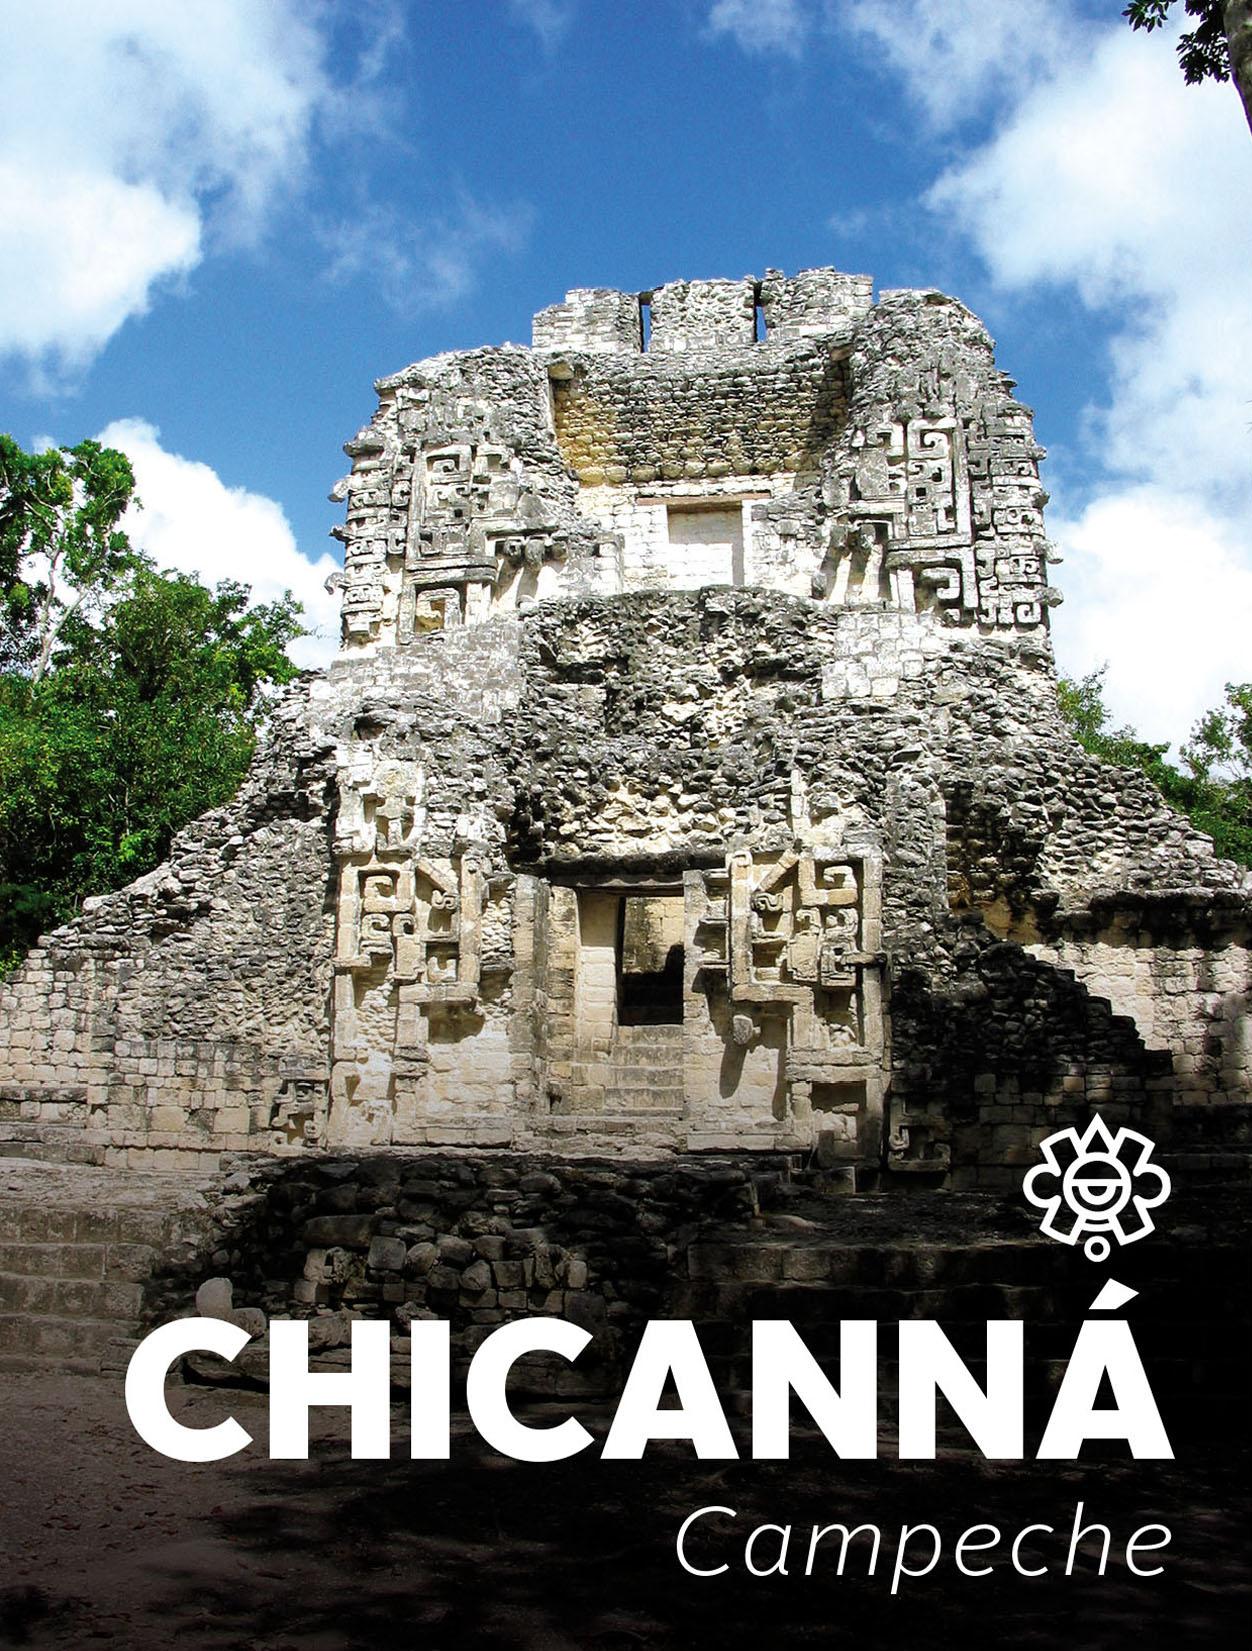 Chicanná